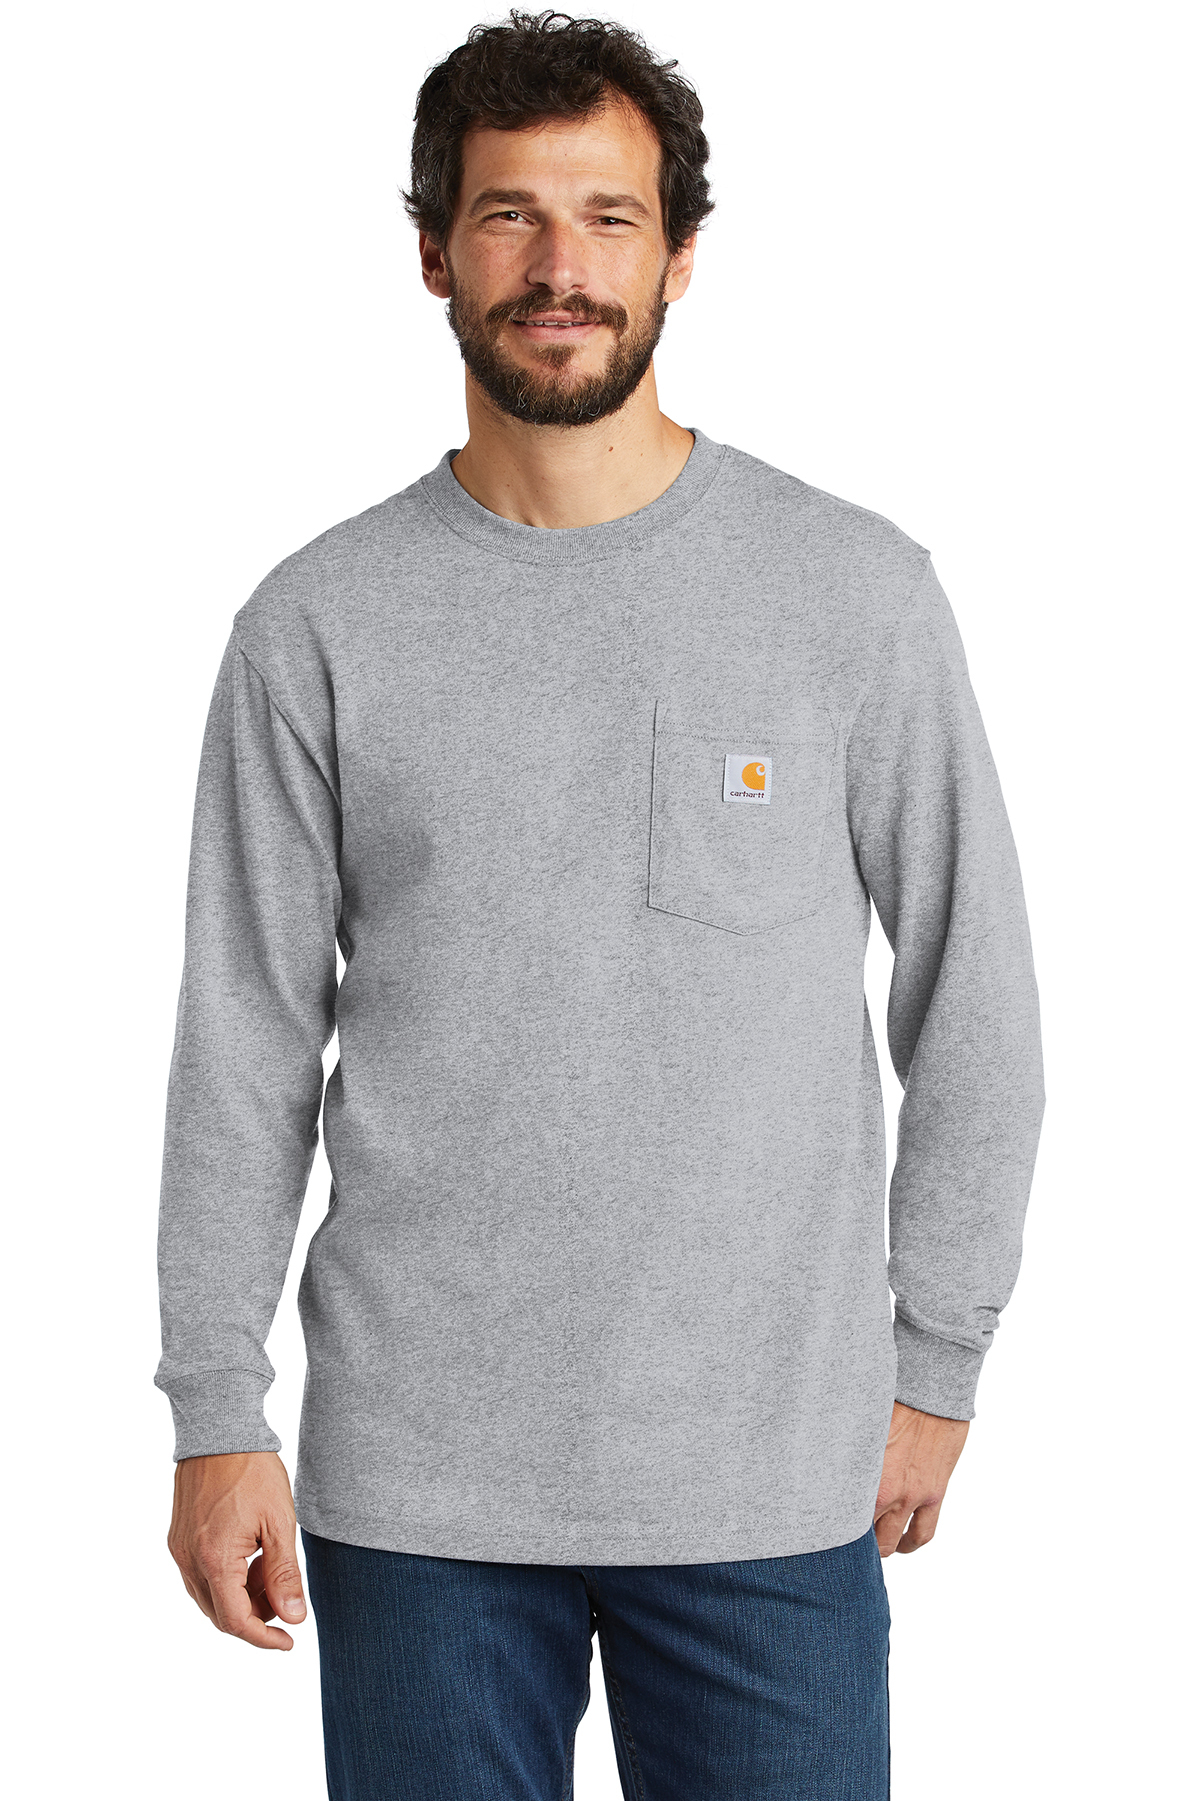 b01b4ca635 Carhartt ® Workwear Pocket Long Sleeve T-Shirt   Carhartt   Brands ...